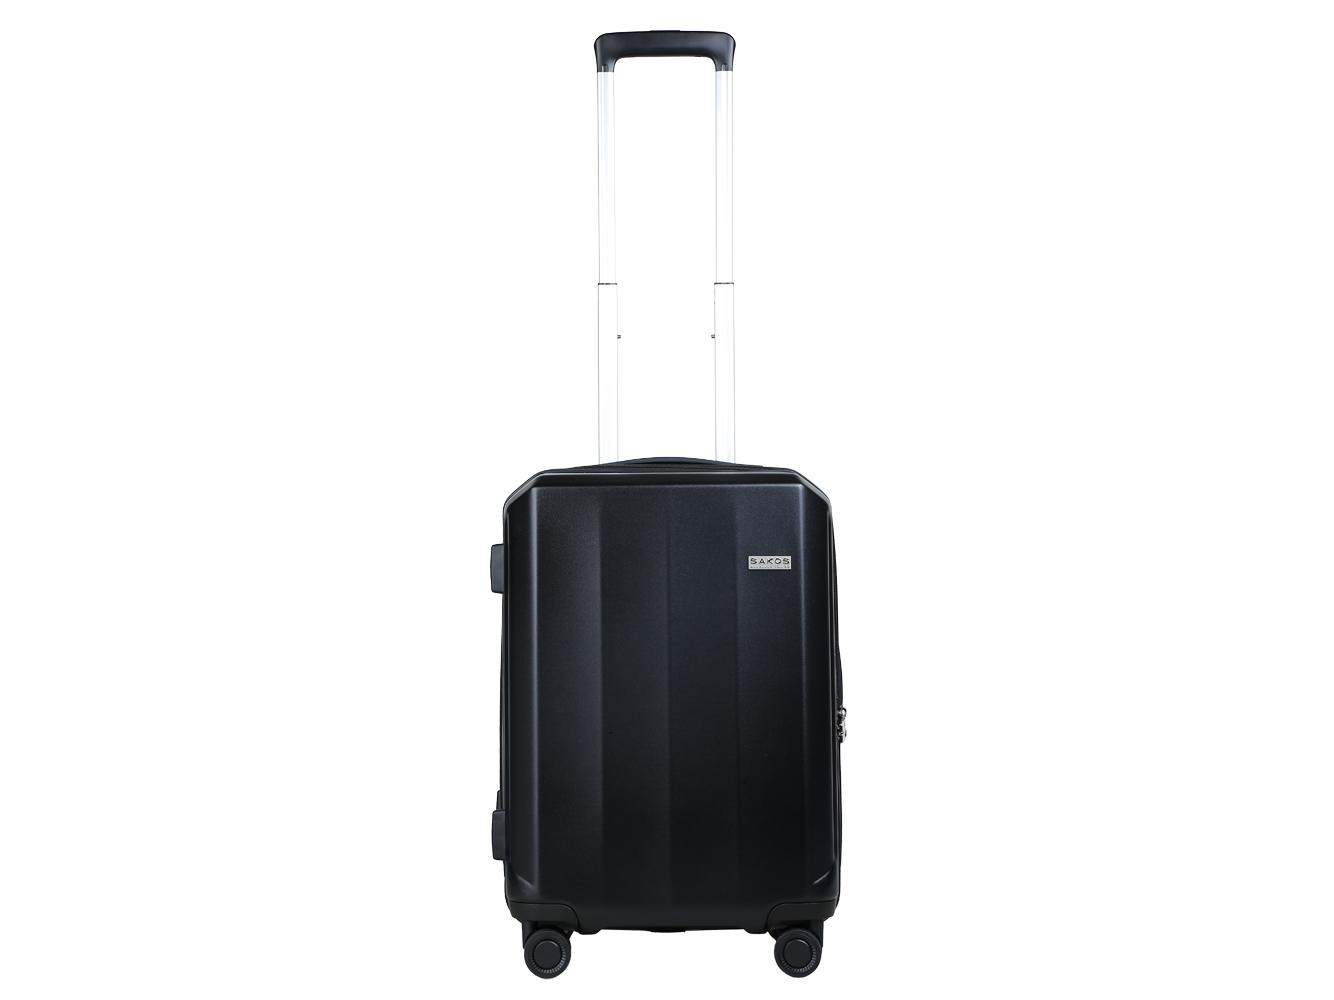 Vali du lịch Sakos Vertica Z22